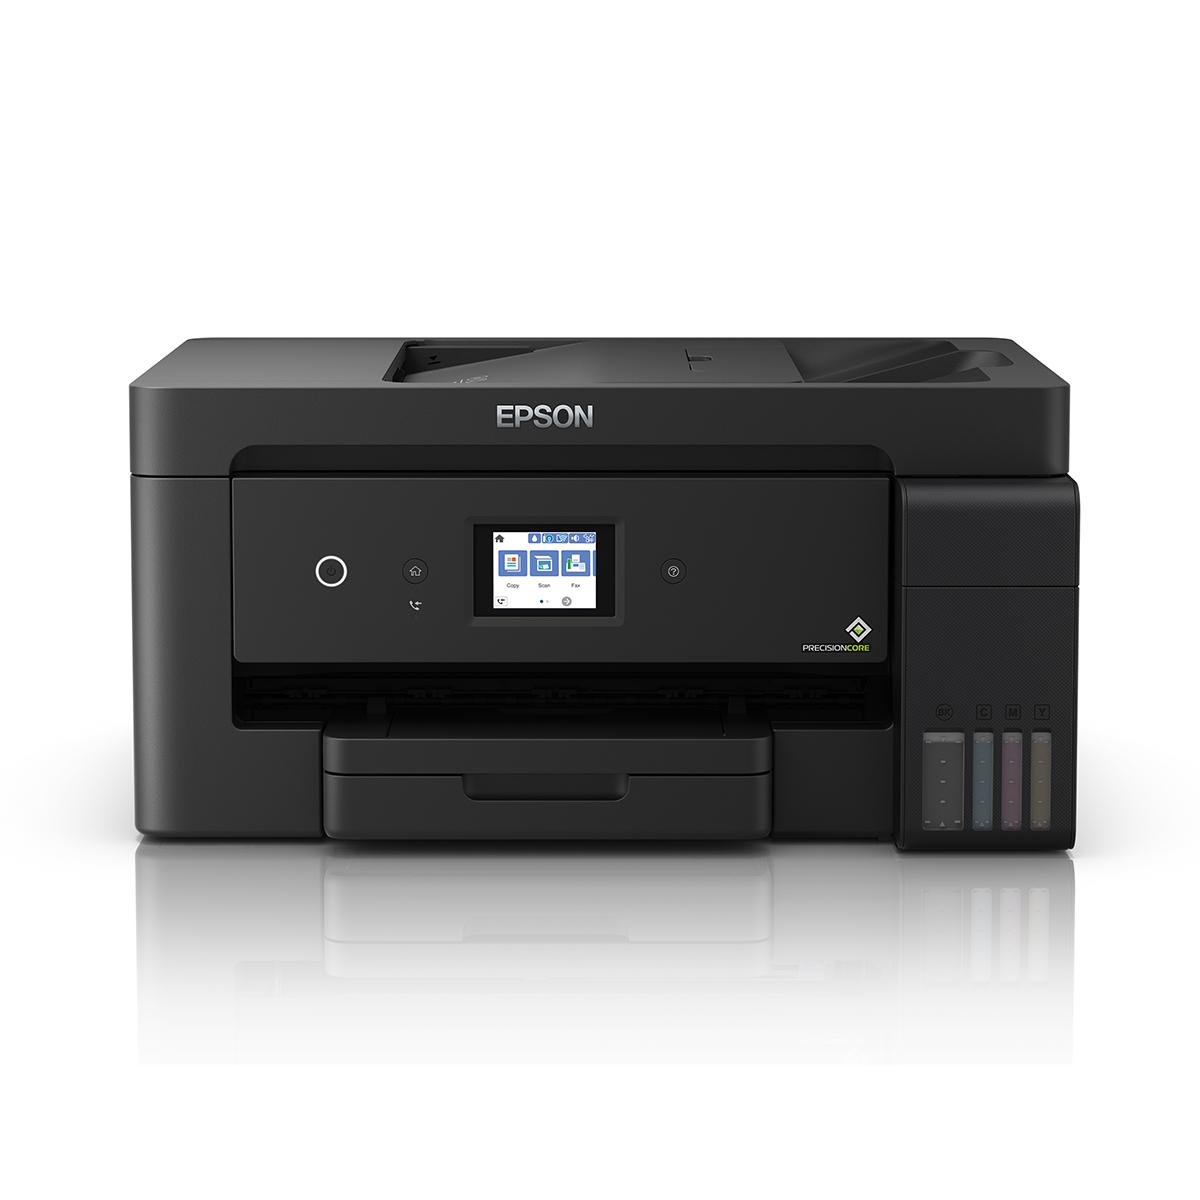 Epson EcoTank ET-15000 A3 Colour Inkjet Multifunction